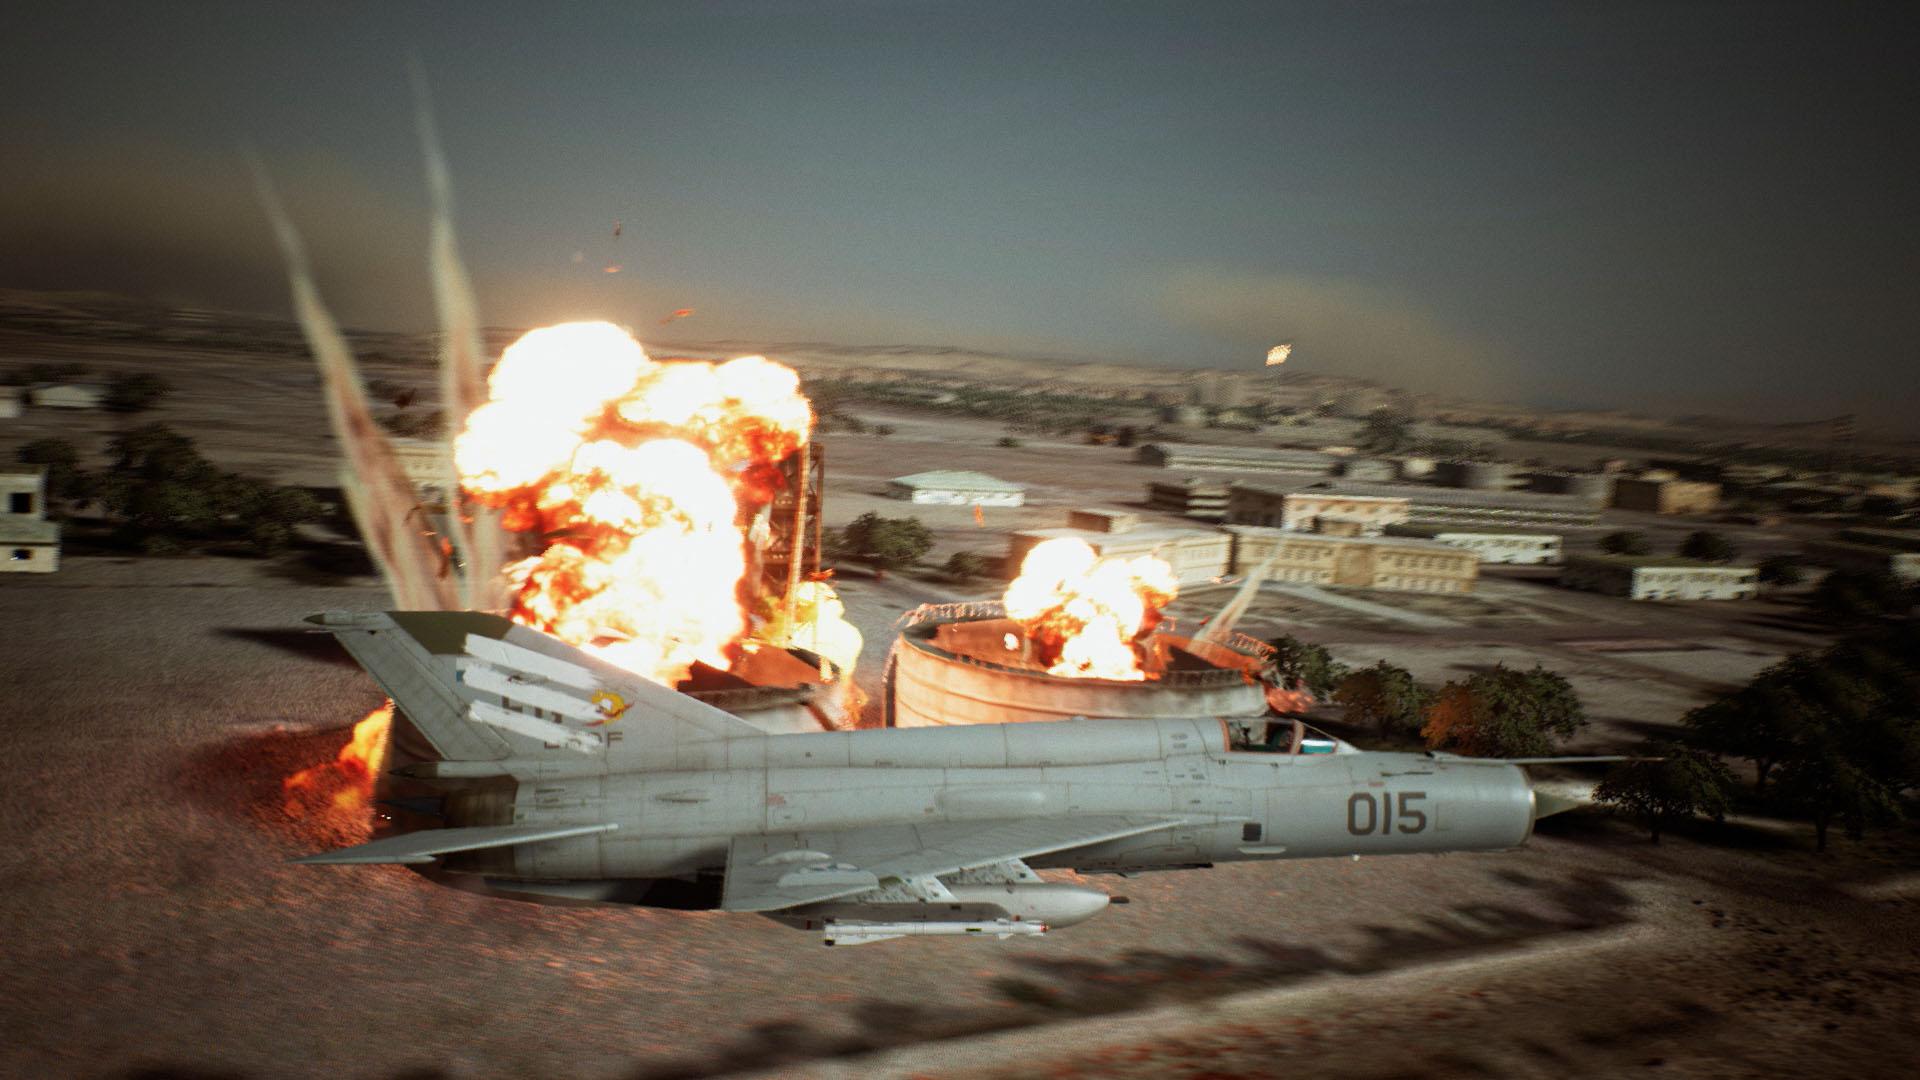 Ace Combat 7 43